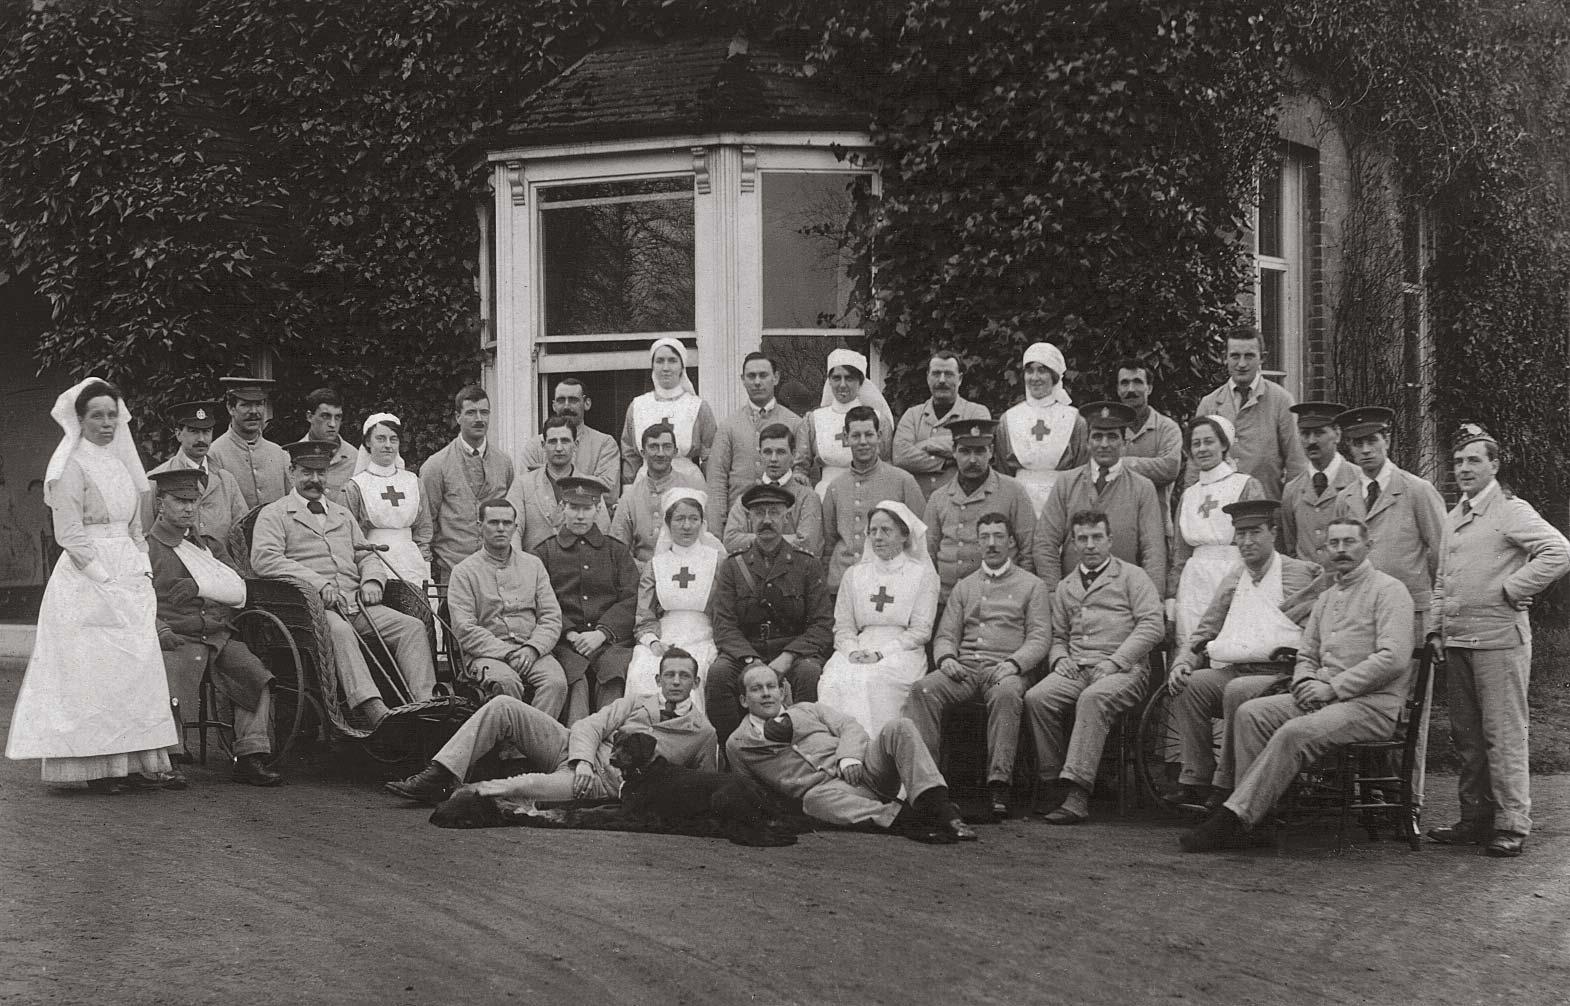 Lidwells Military Hospital, Goudhurst